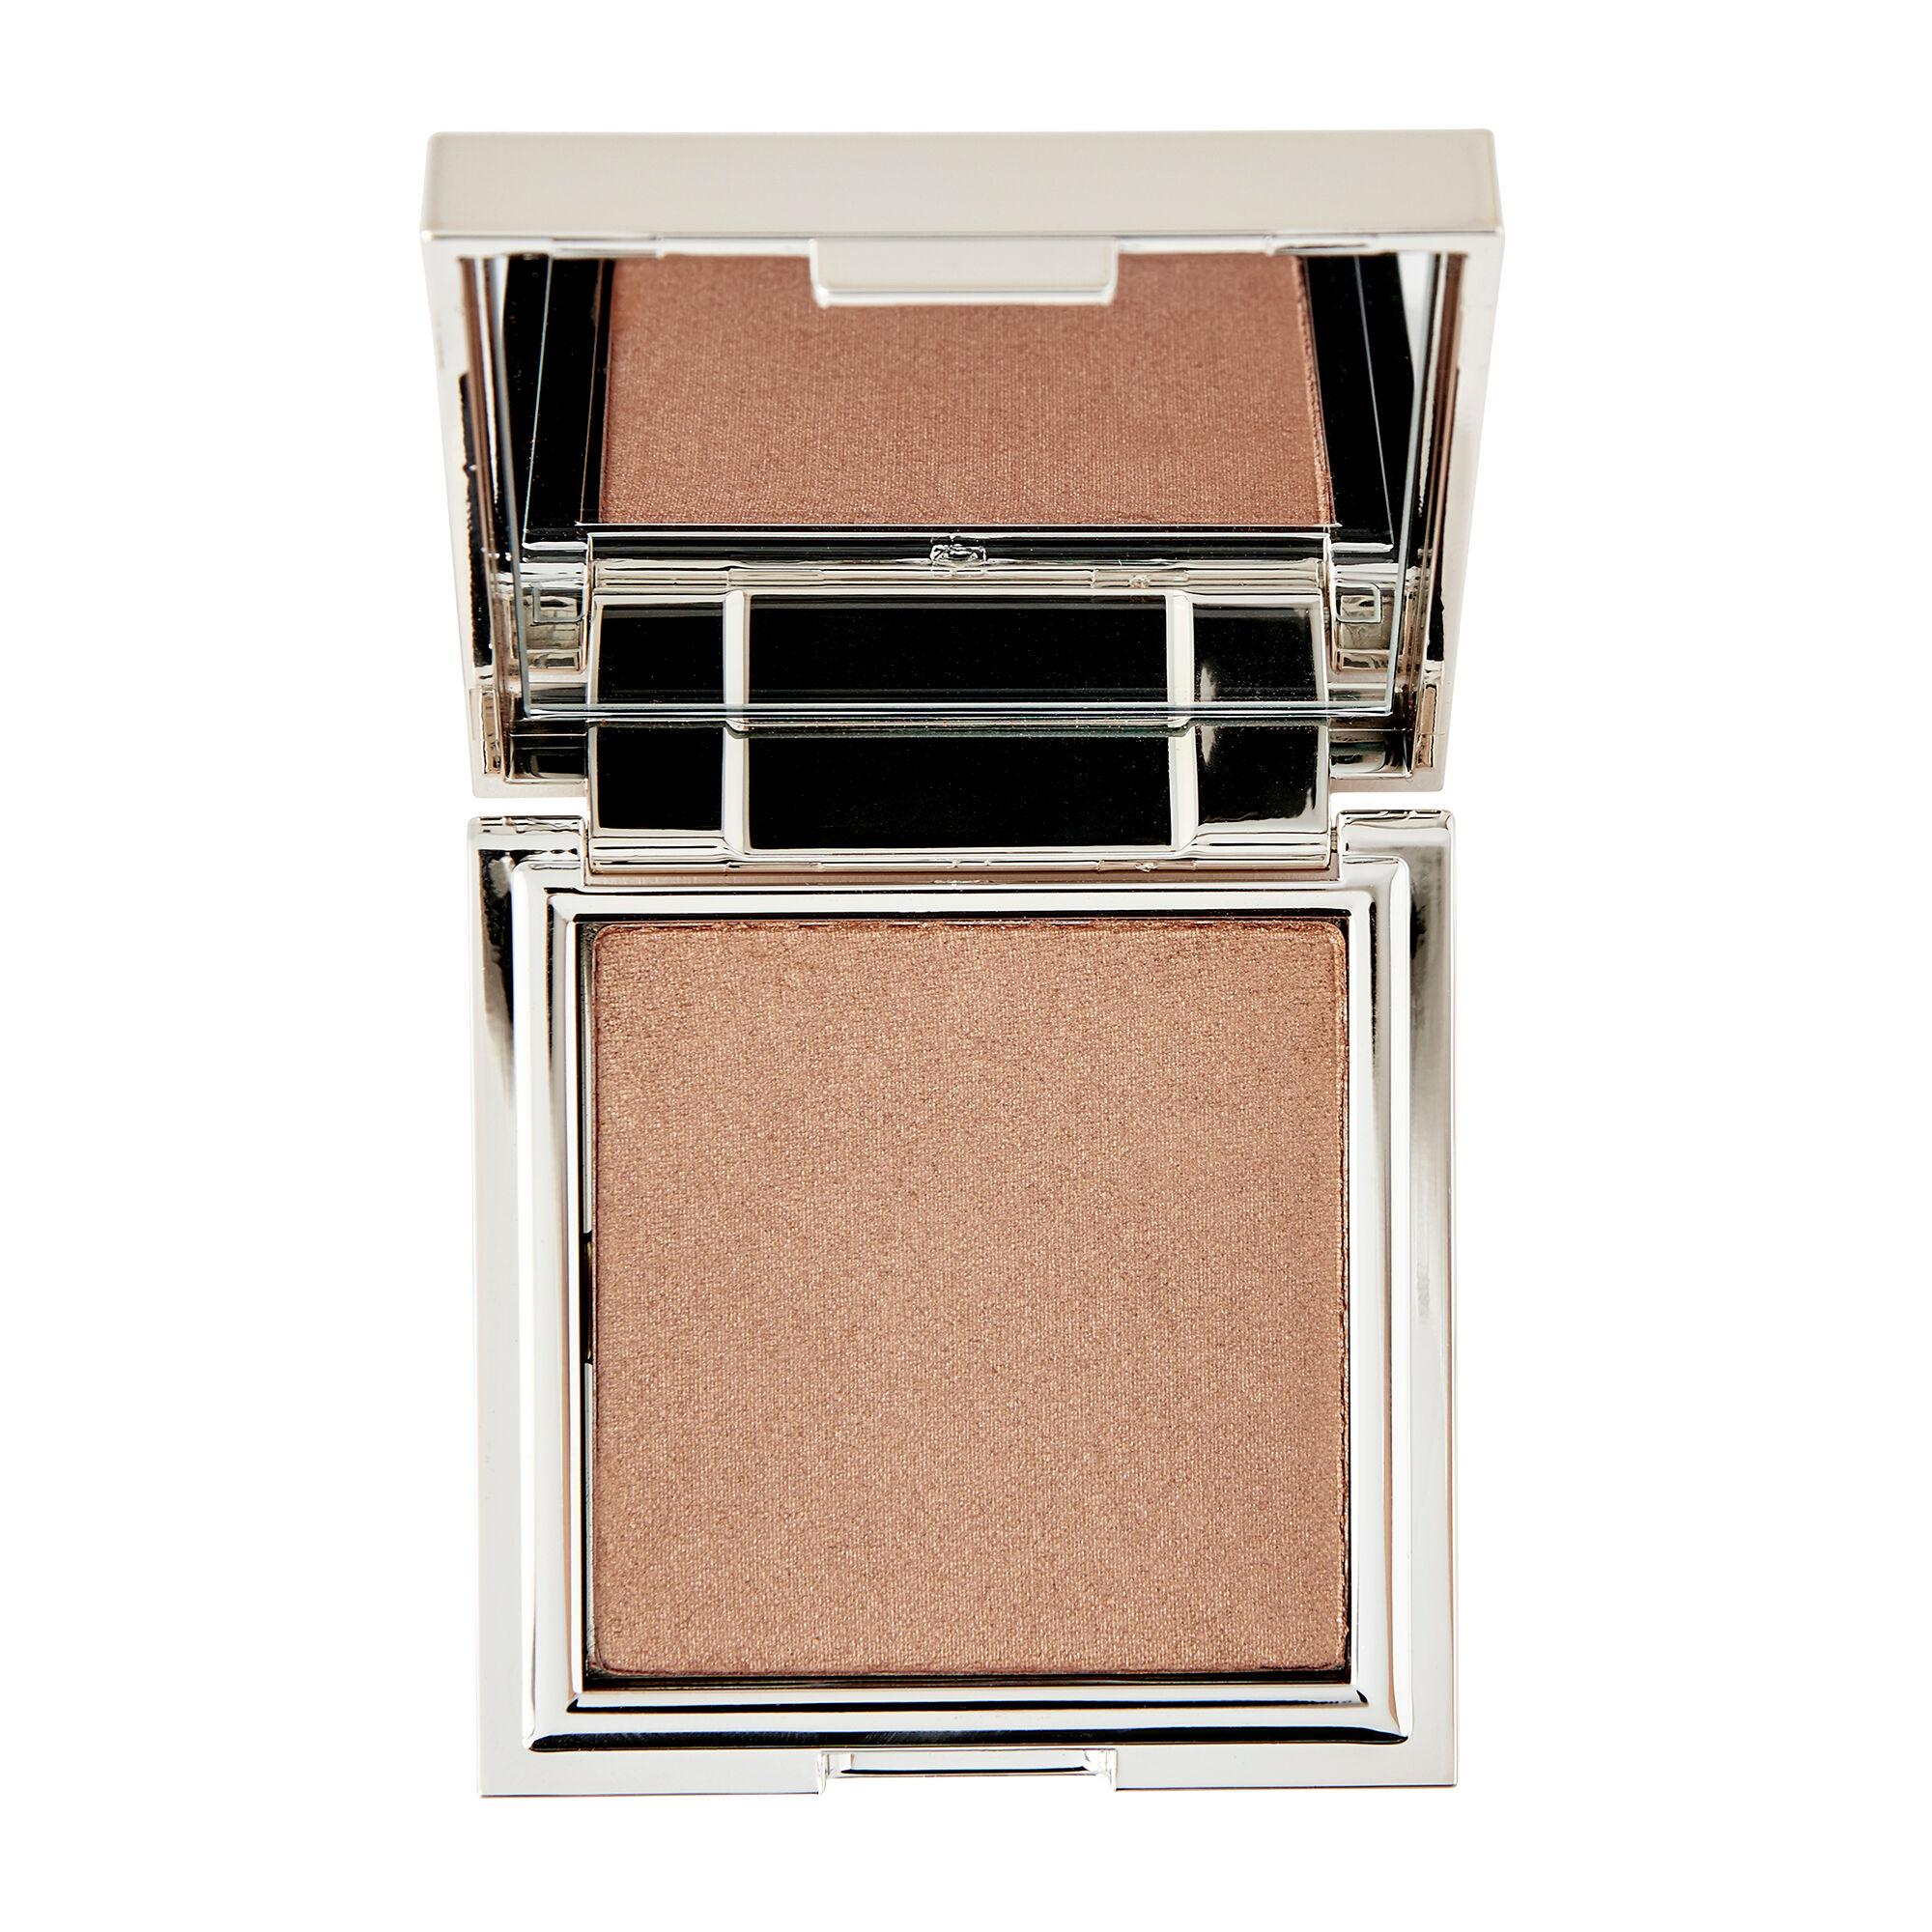 Jouer Cosmetics Powder Highlighter Tan Lines 4.5g